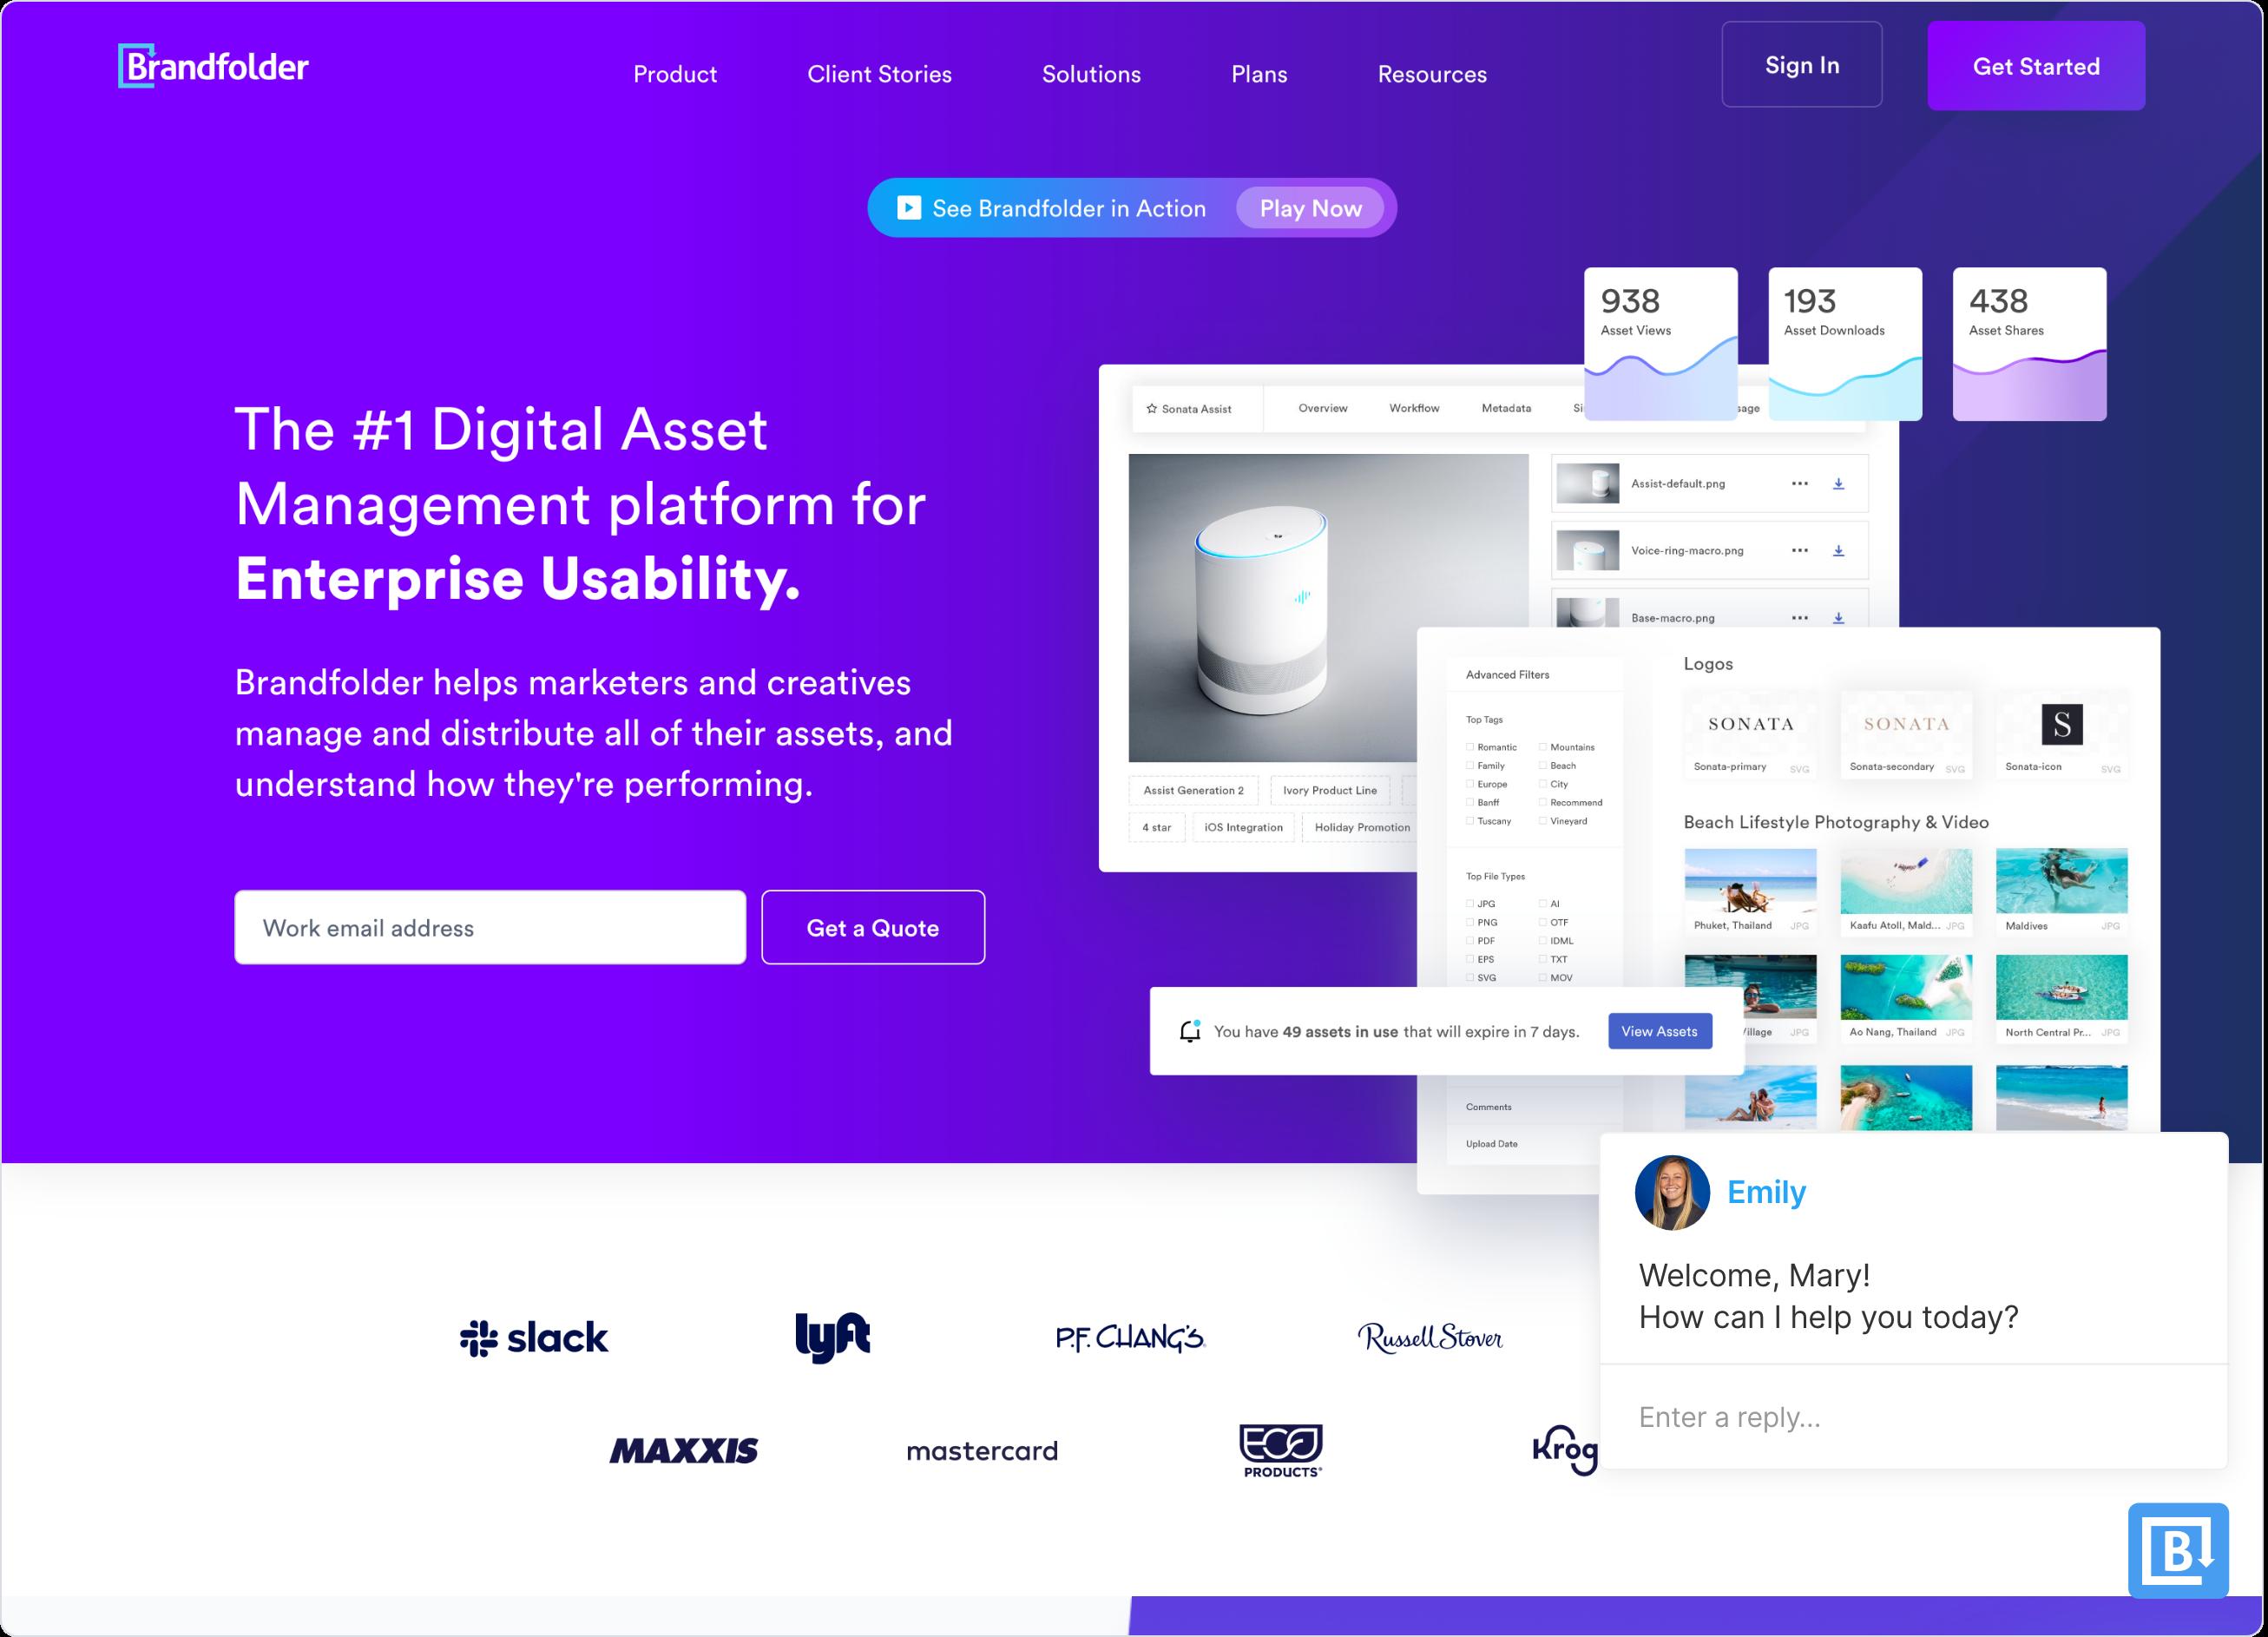 Brandfolder uses Qualified's Conversational Marketing Platform